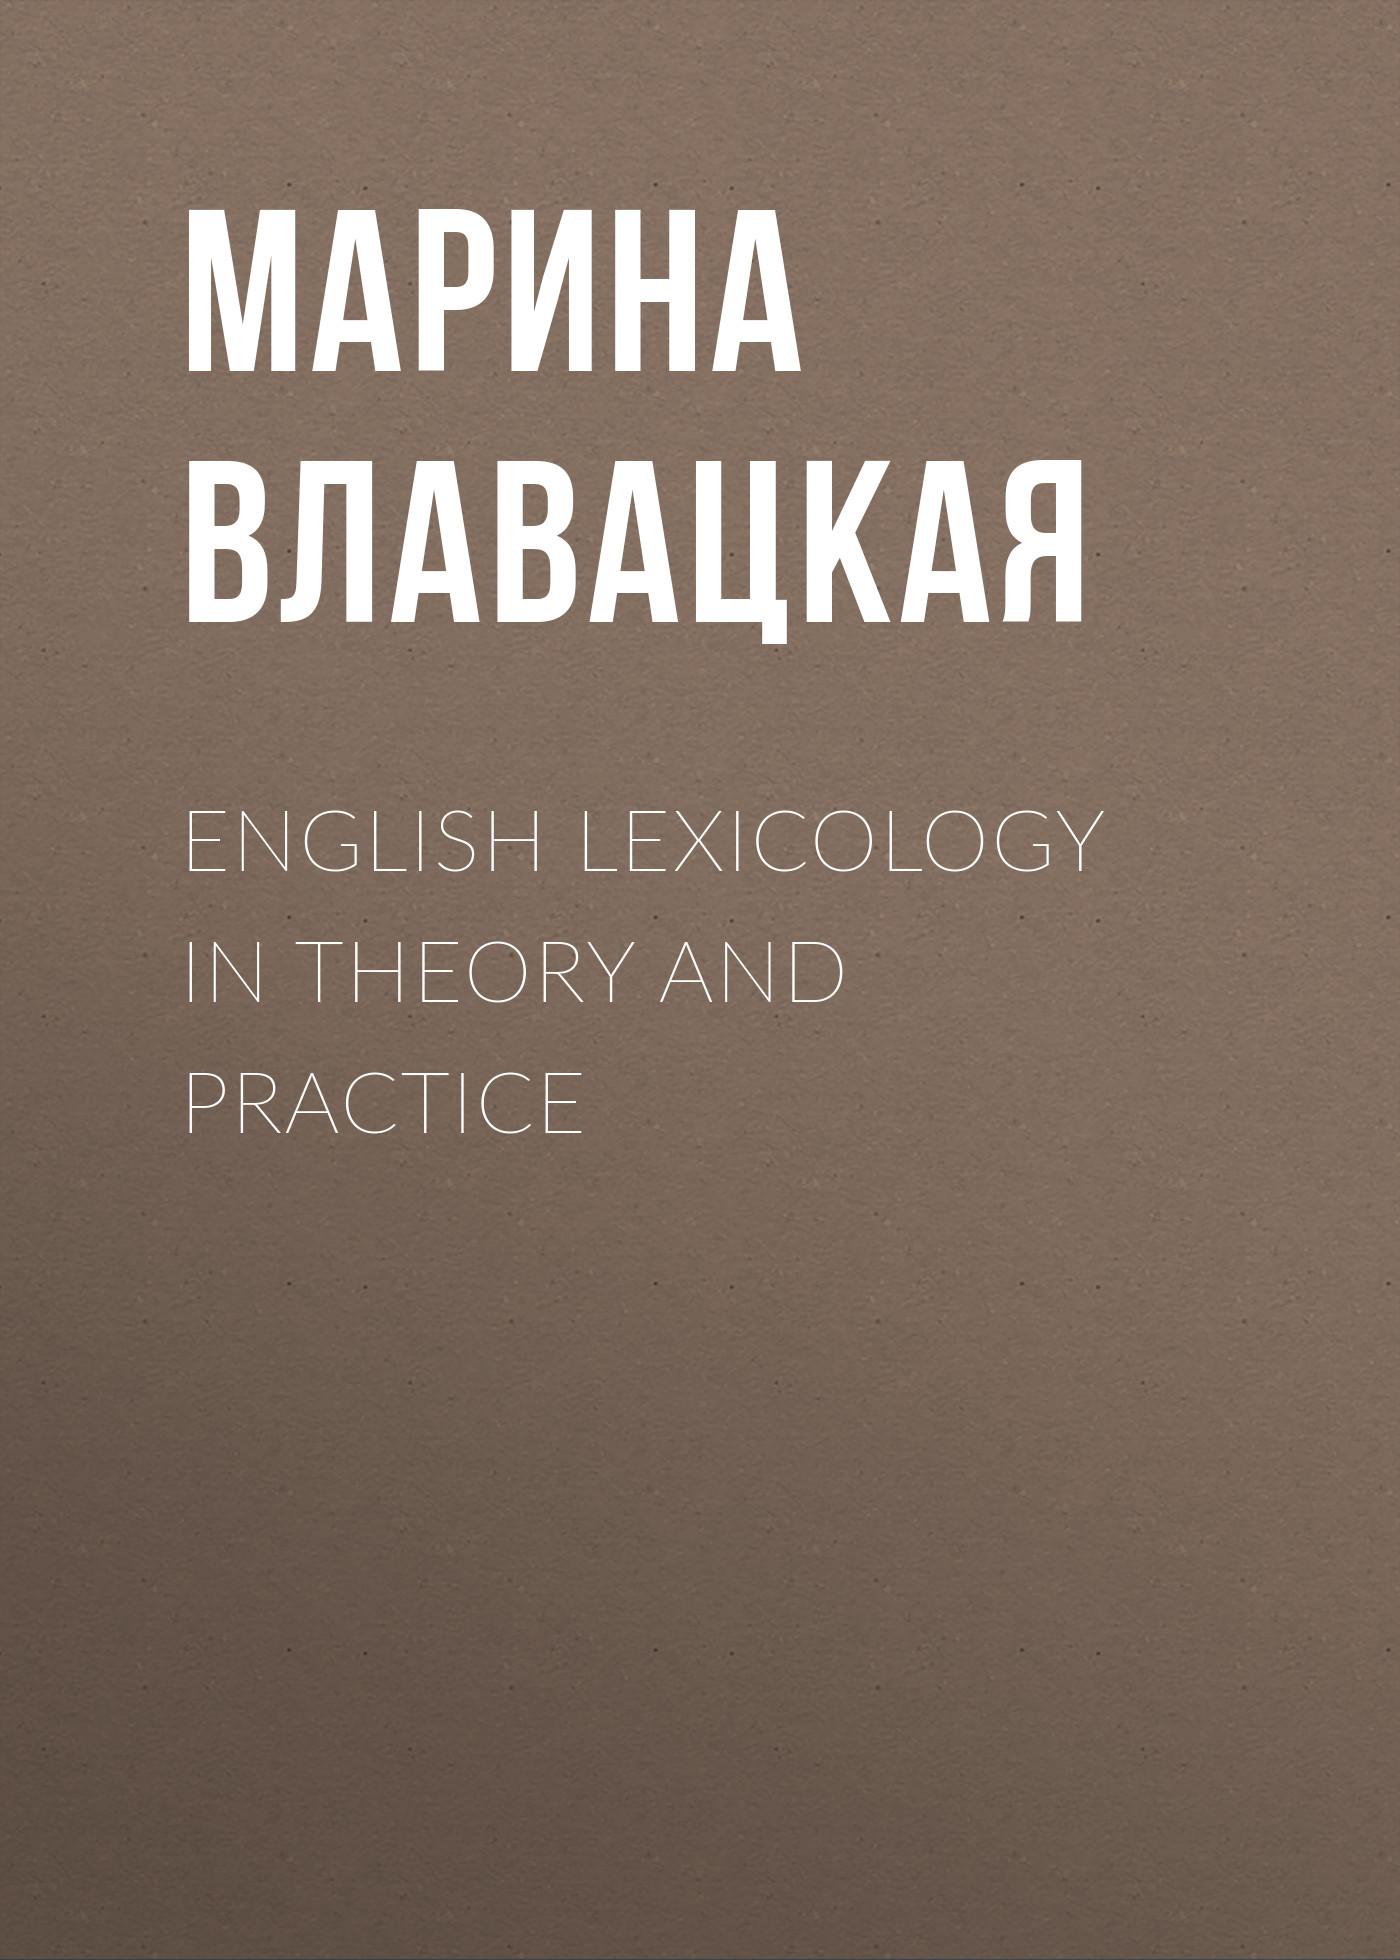 Марина Влавацкая English Lexicology in Theory and Practice продуктивная коммуникация лингвистика результативности